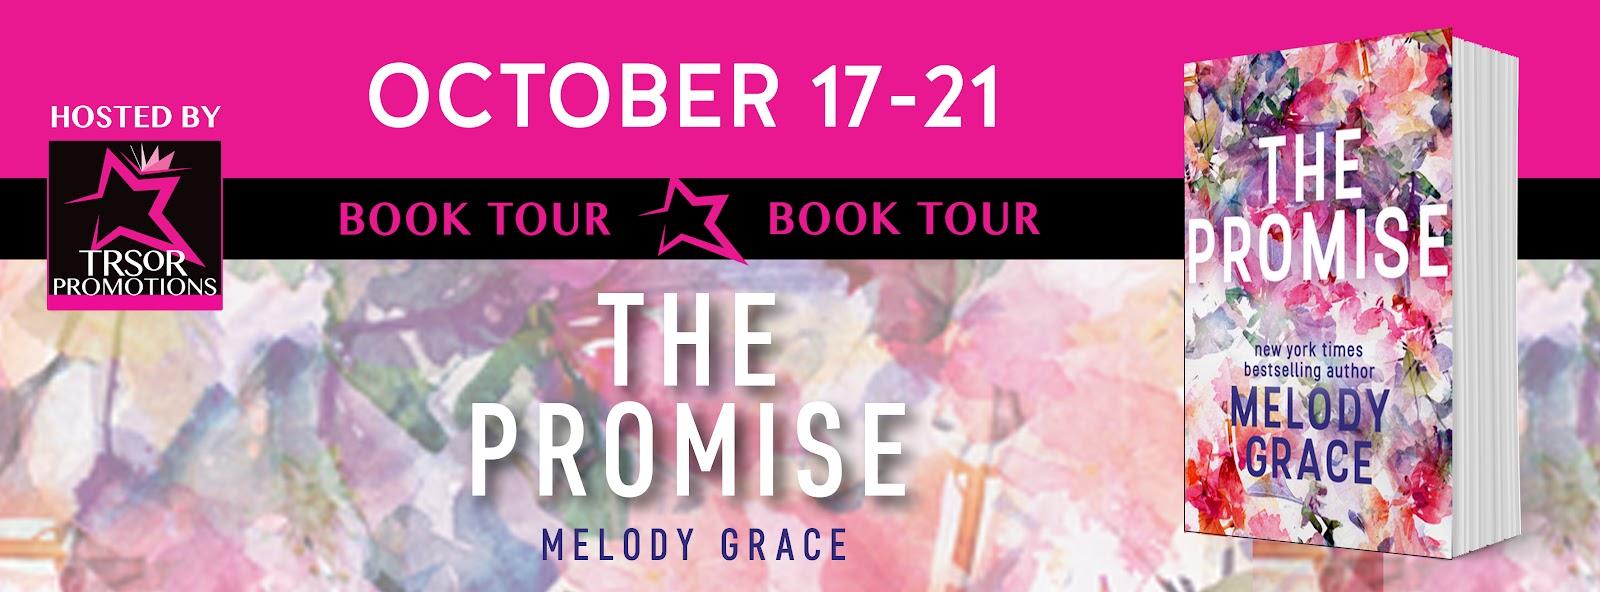 THE_PROMISE_BOOK_TOUR.jpg